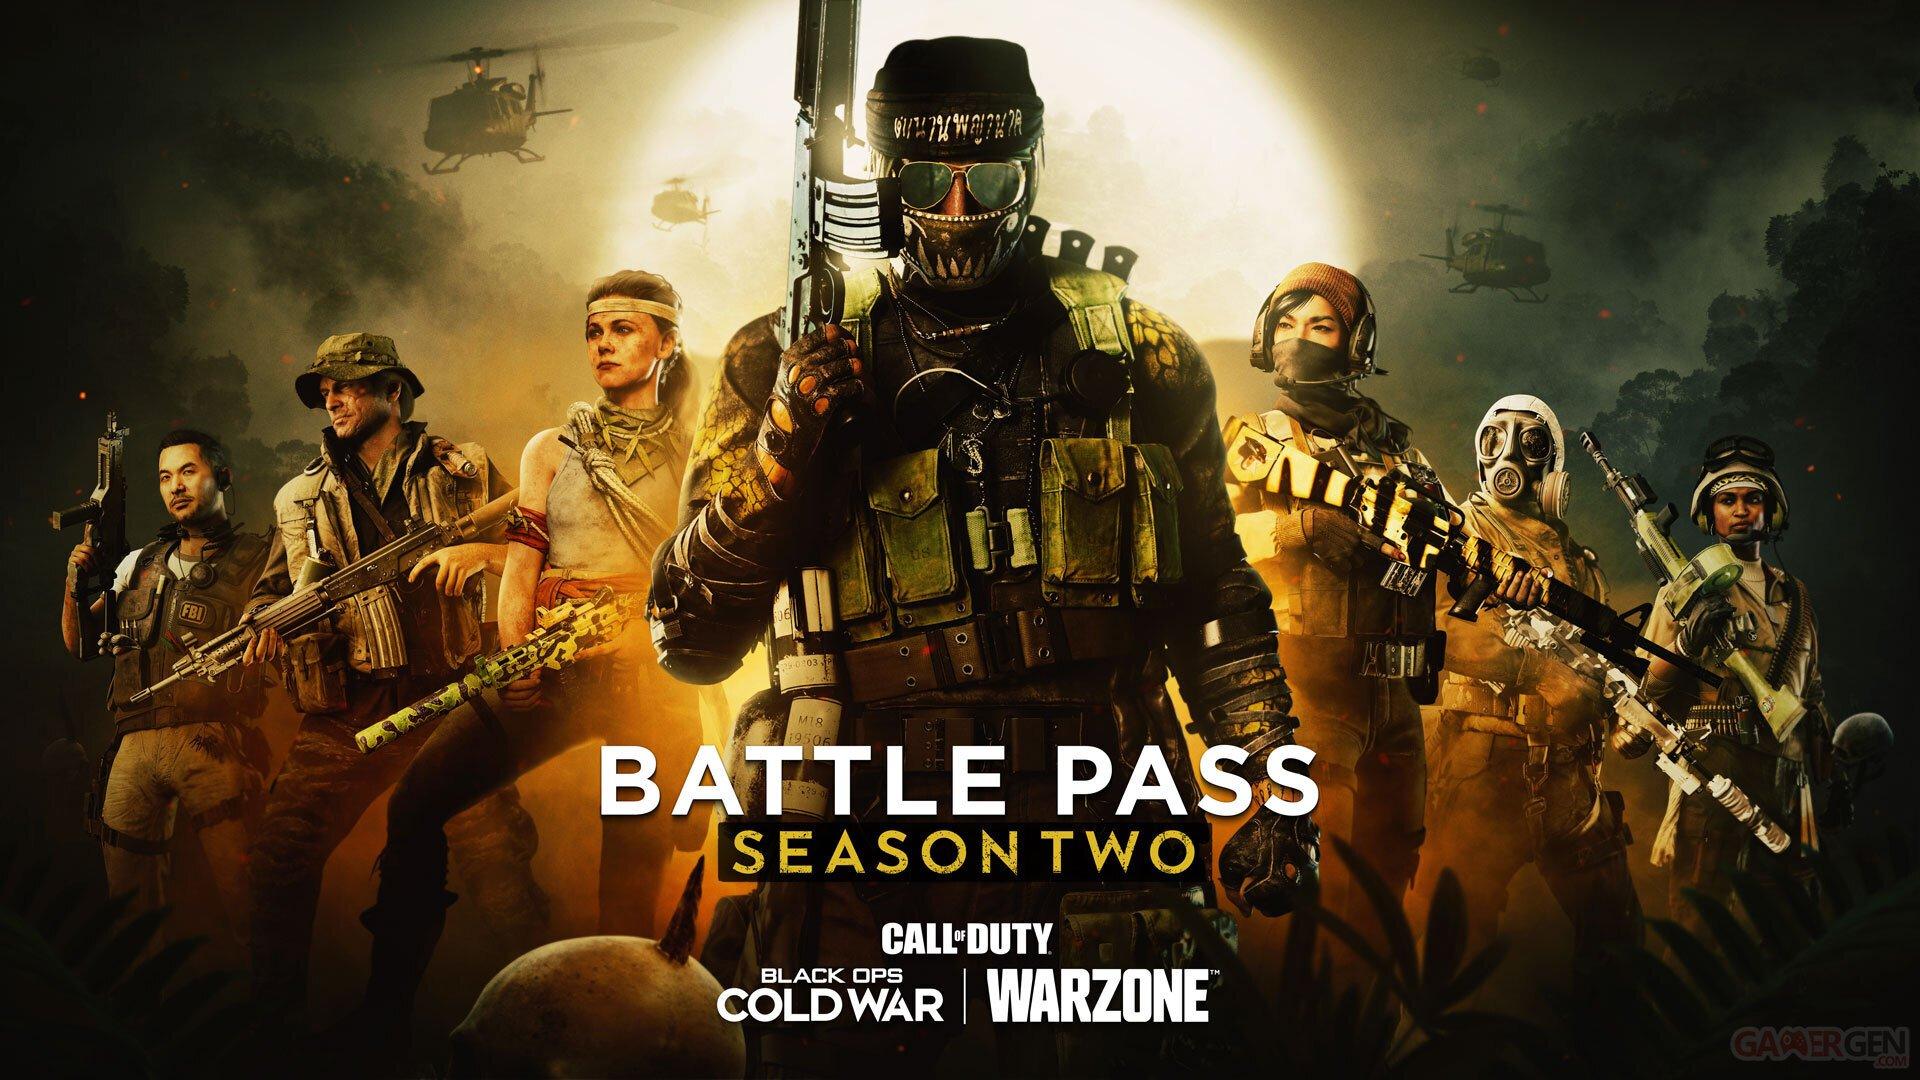 Call of Duty: Black Ops warzone saison deux annonce battle pass